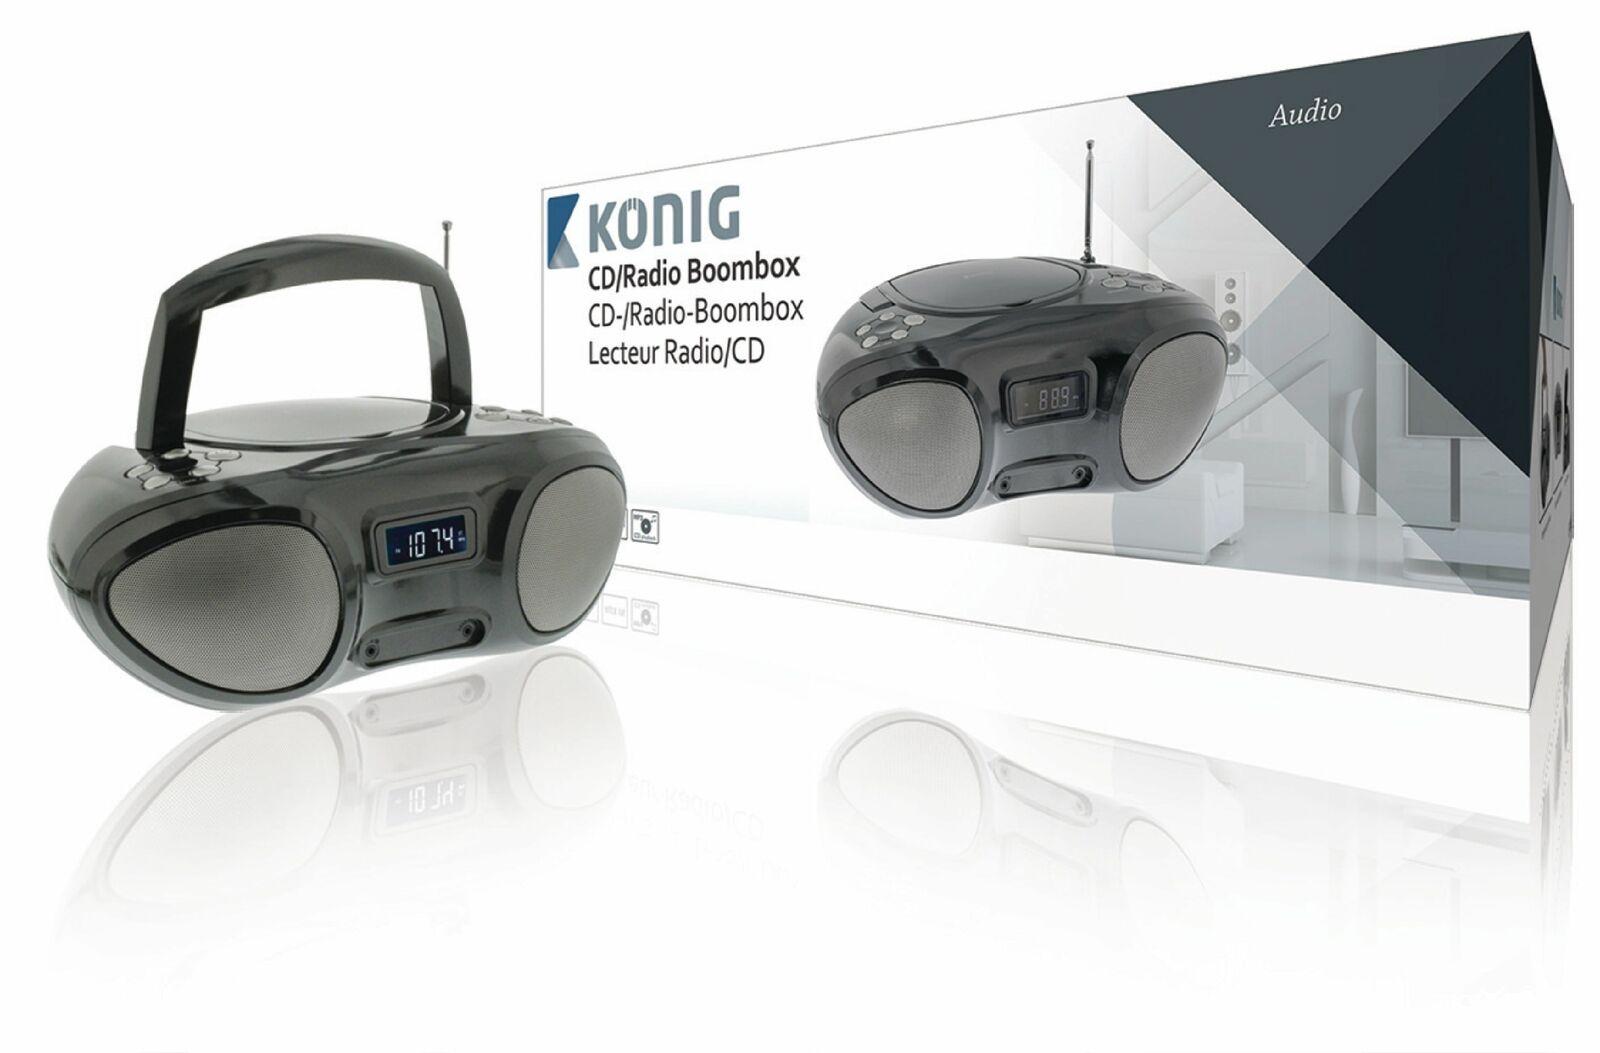 König Tragbarer CD-Player Mini Stereoanlage Kompaktanlage CD MP3 AUX Radio